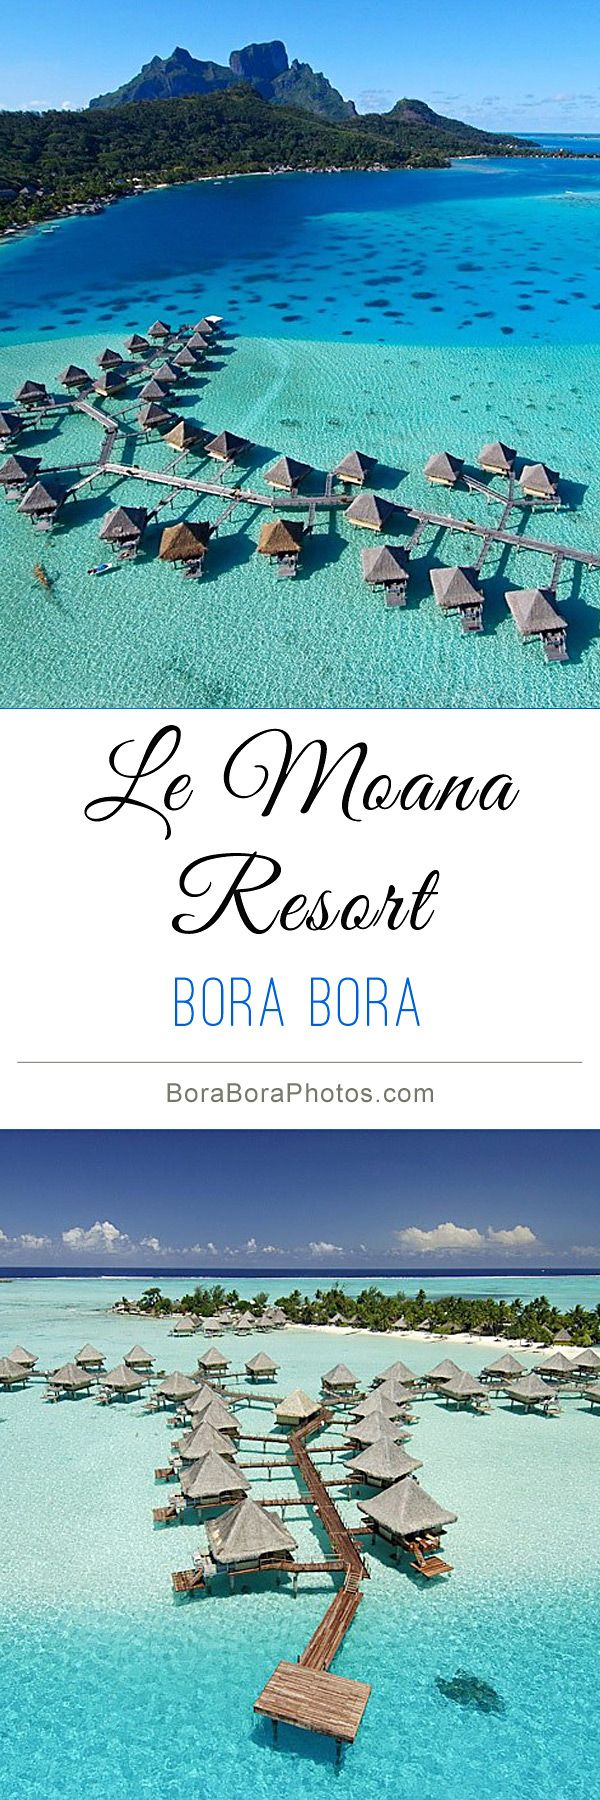 Intercontinental Le Moana This Bora Bora Island Resort Is Situated On The Famous Matira Point One Of The Most Beautiful Beaches In Viaggi Romantici Luoghi Di Vacanza E Paesaggi